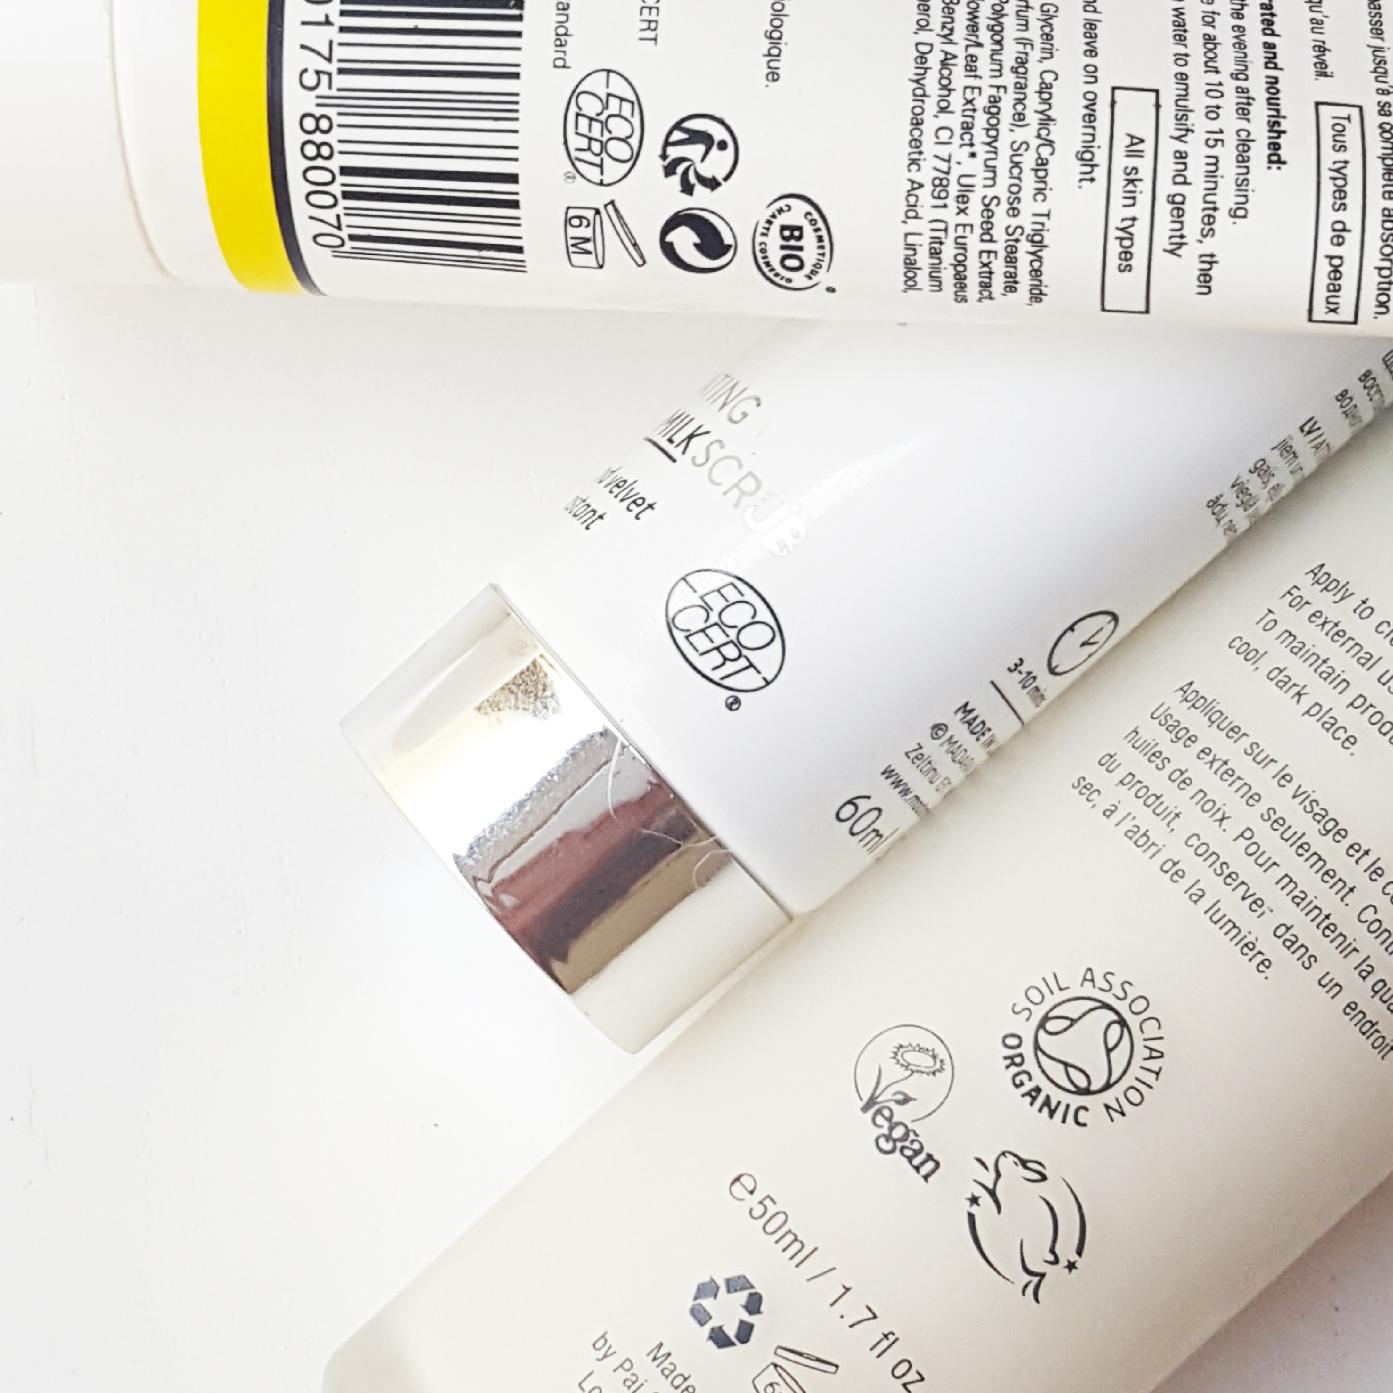 cosmetique bio labels